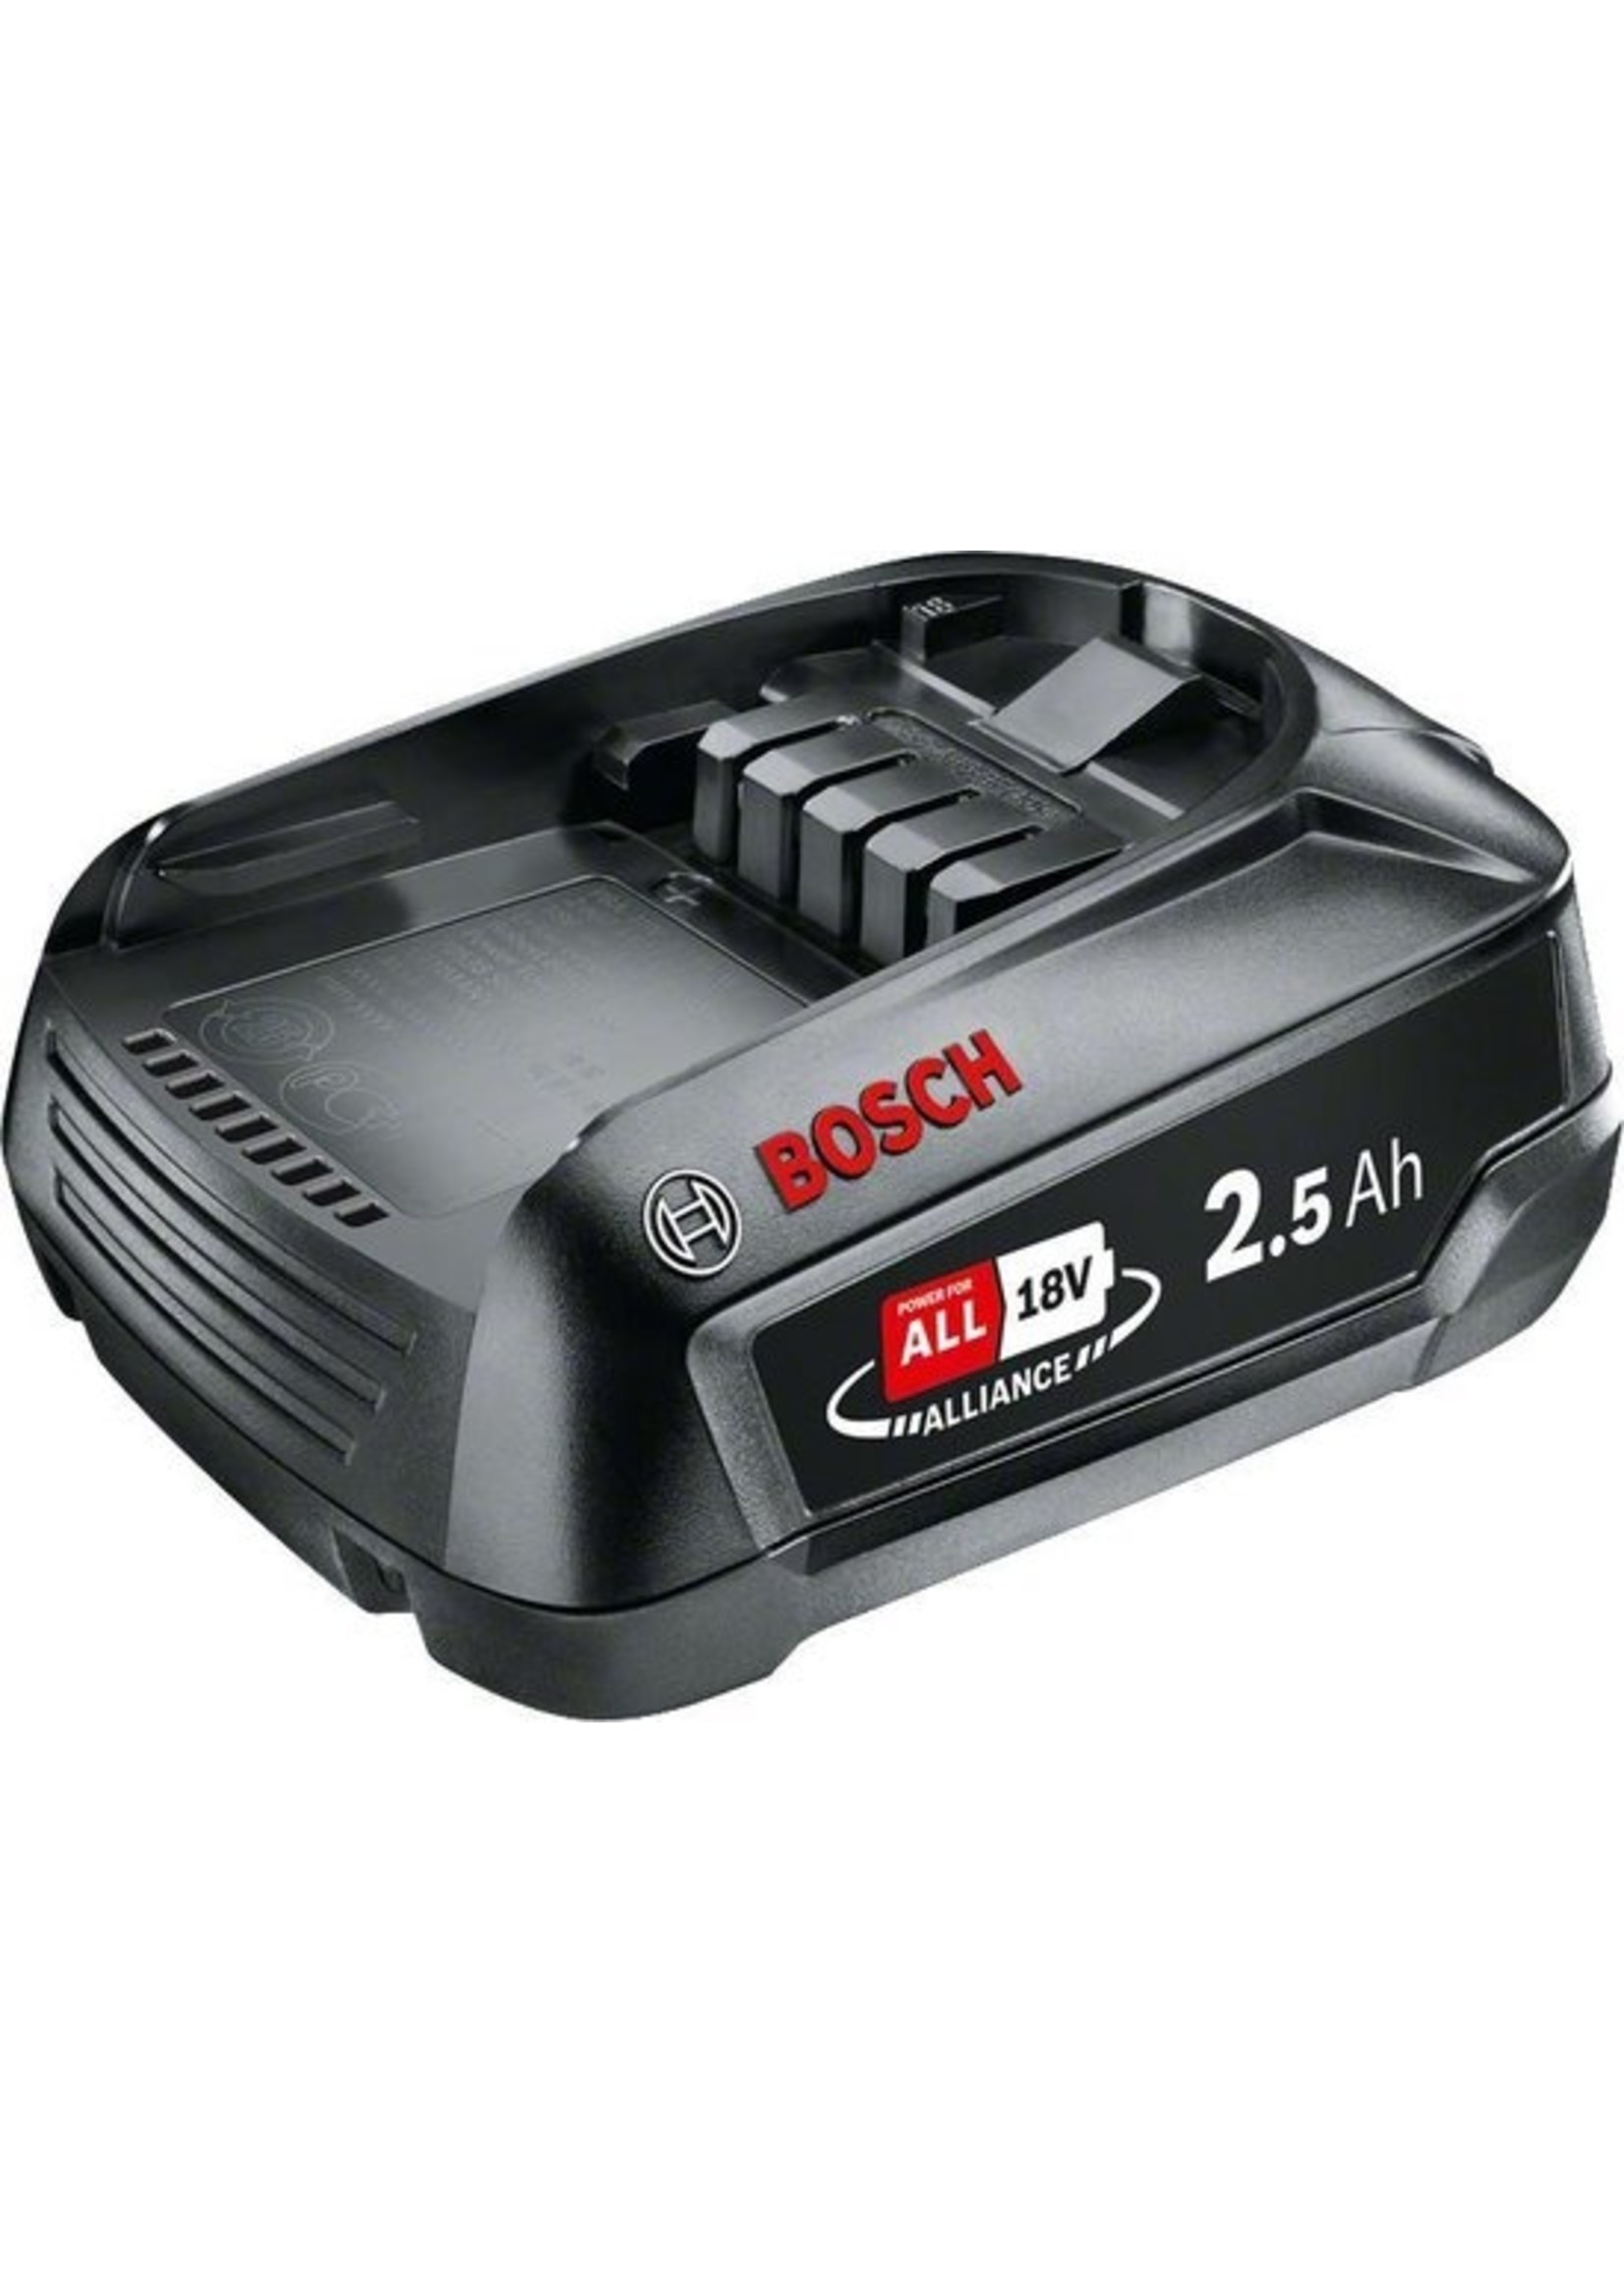 Bosch Bosch Lithium-Ion accu / batterij - 18 Volt - 2,5 Ah - Cordless family concept - exclusief oplader